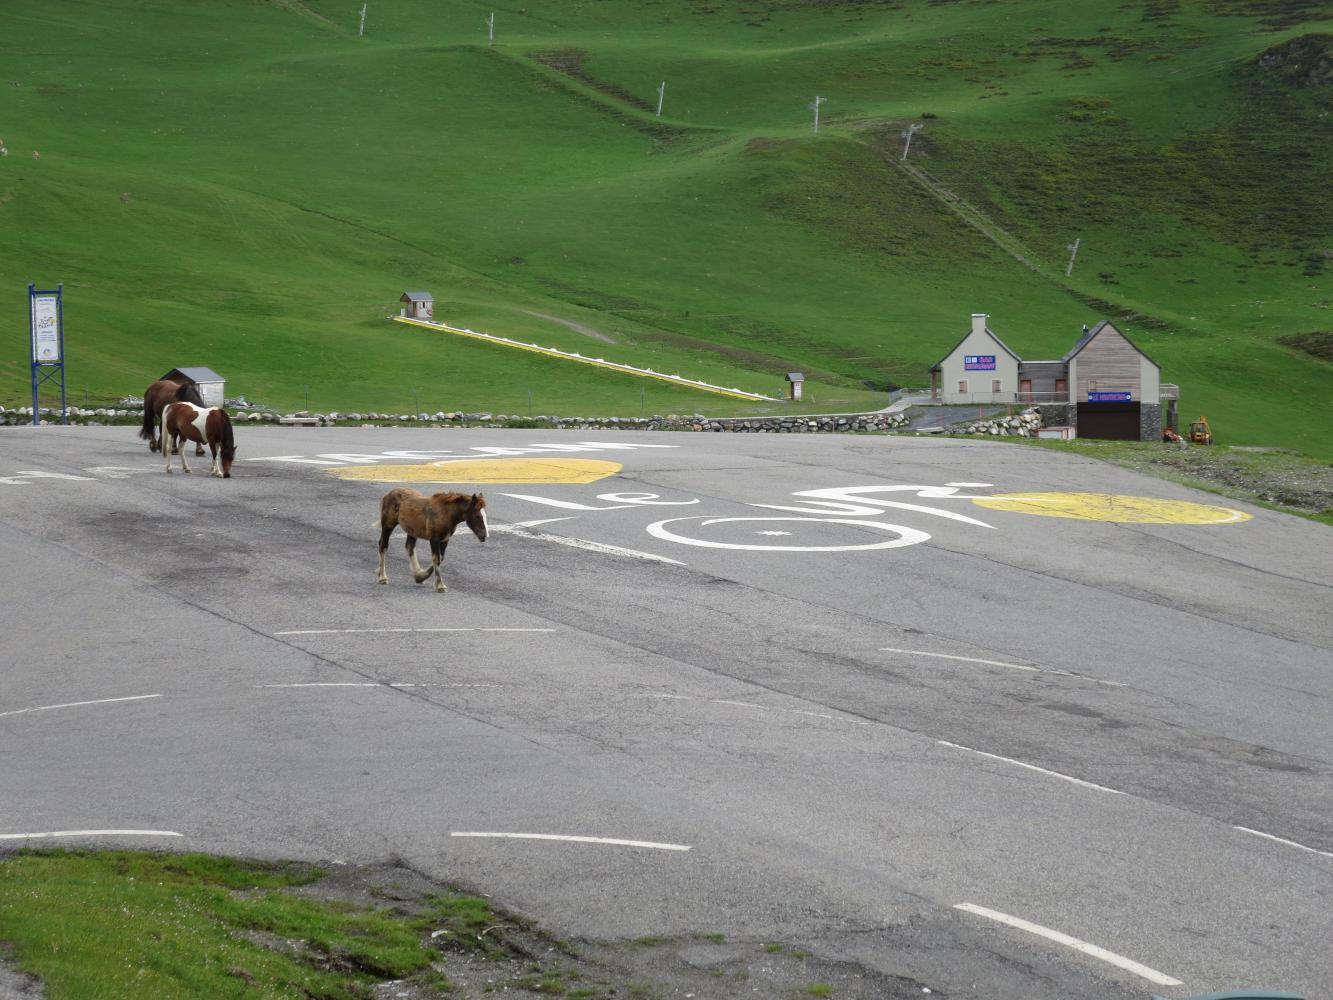 Col de Trammasel (Hautacam) Bike Climb - PJAMM Cycling